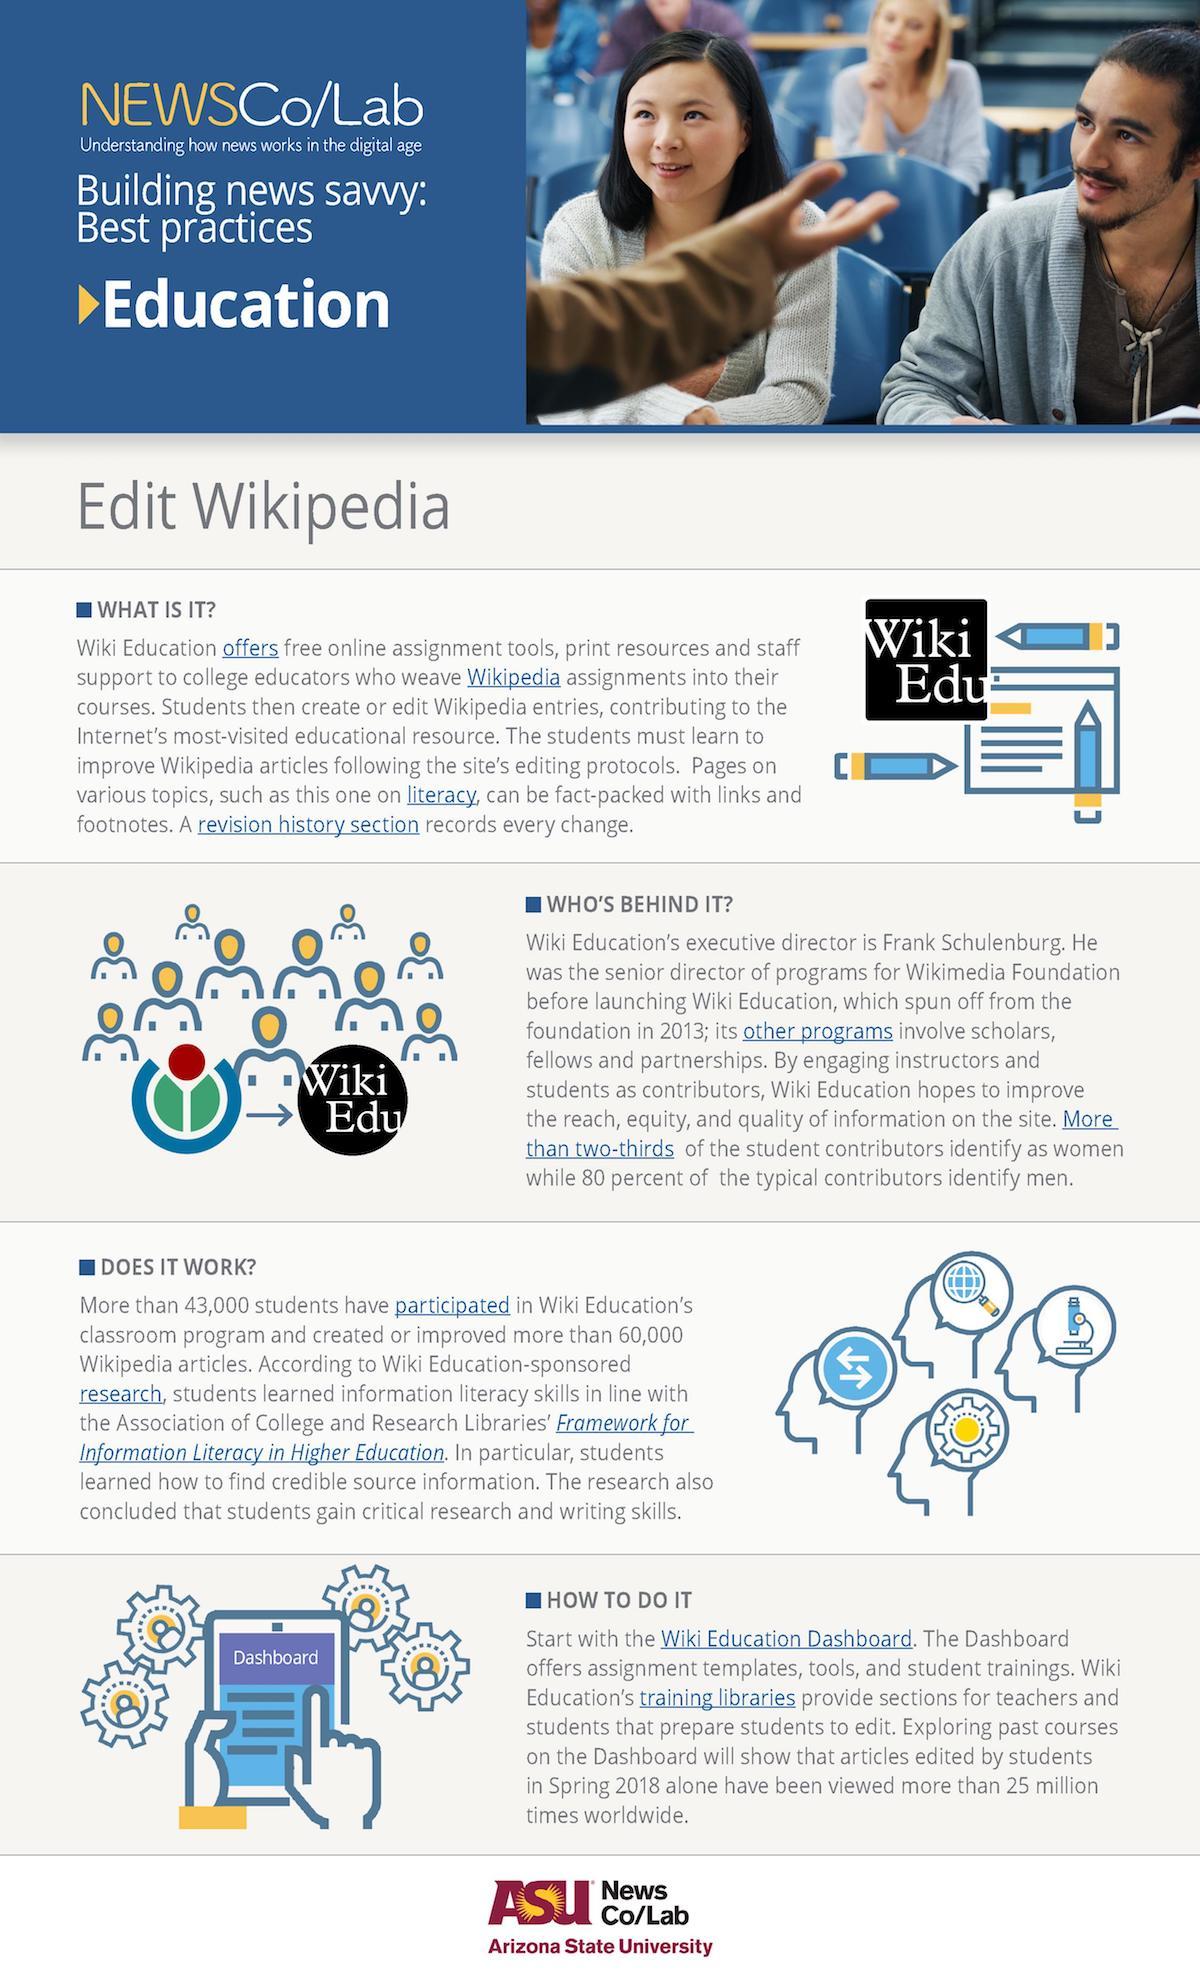 Best Practice: Wiki Education